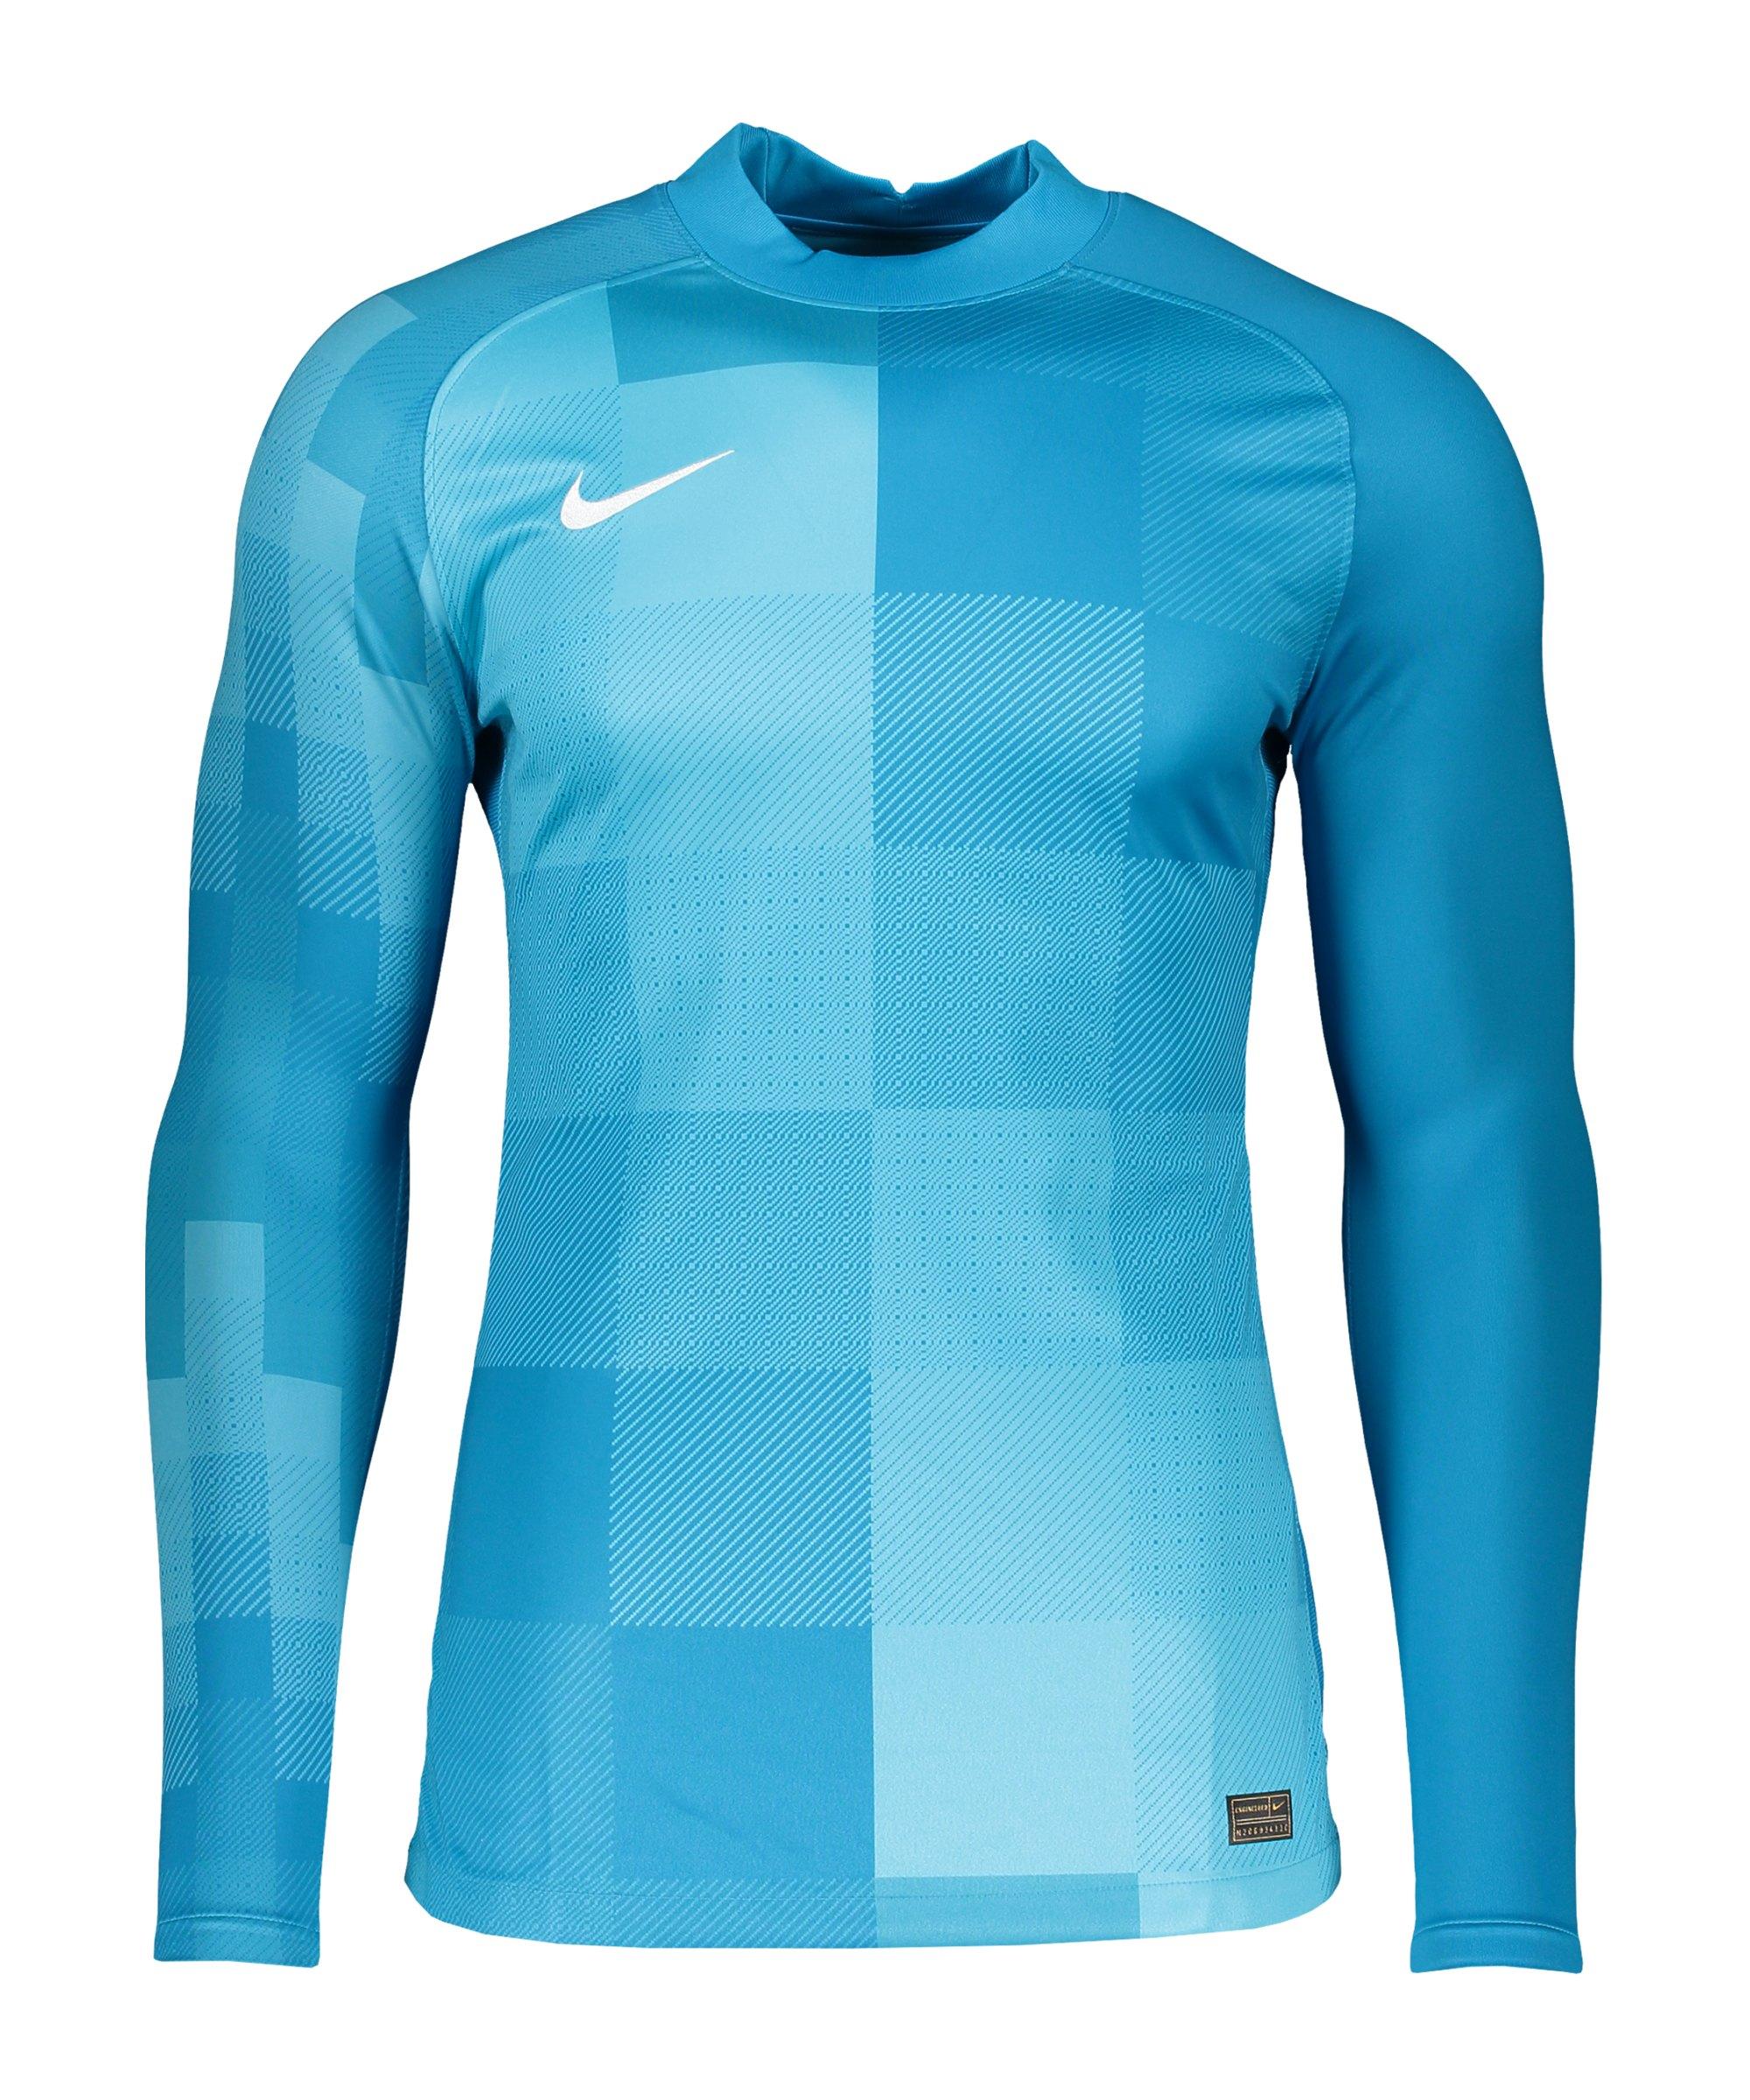 Nike Promo TW-Trikot langarm Blau F411 - blau